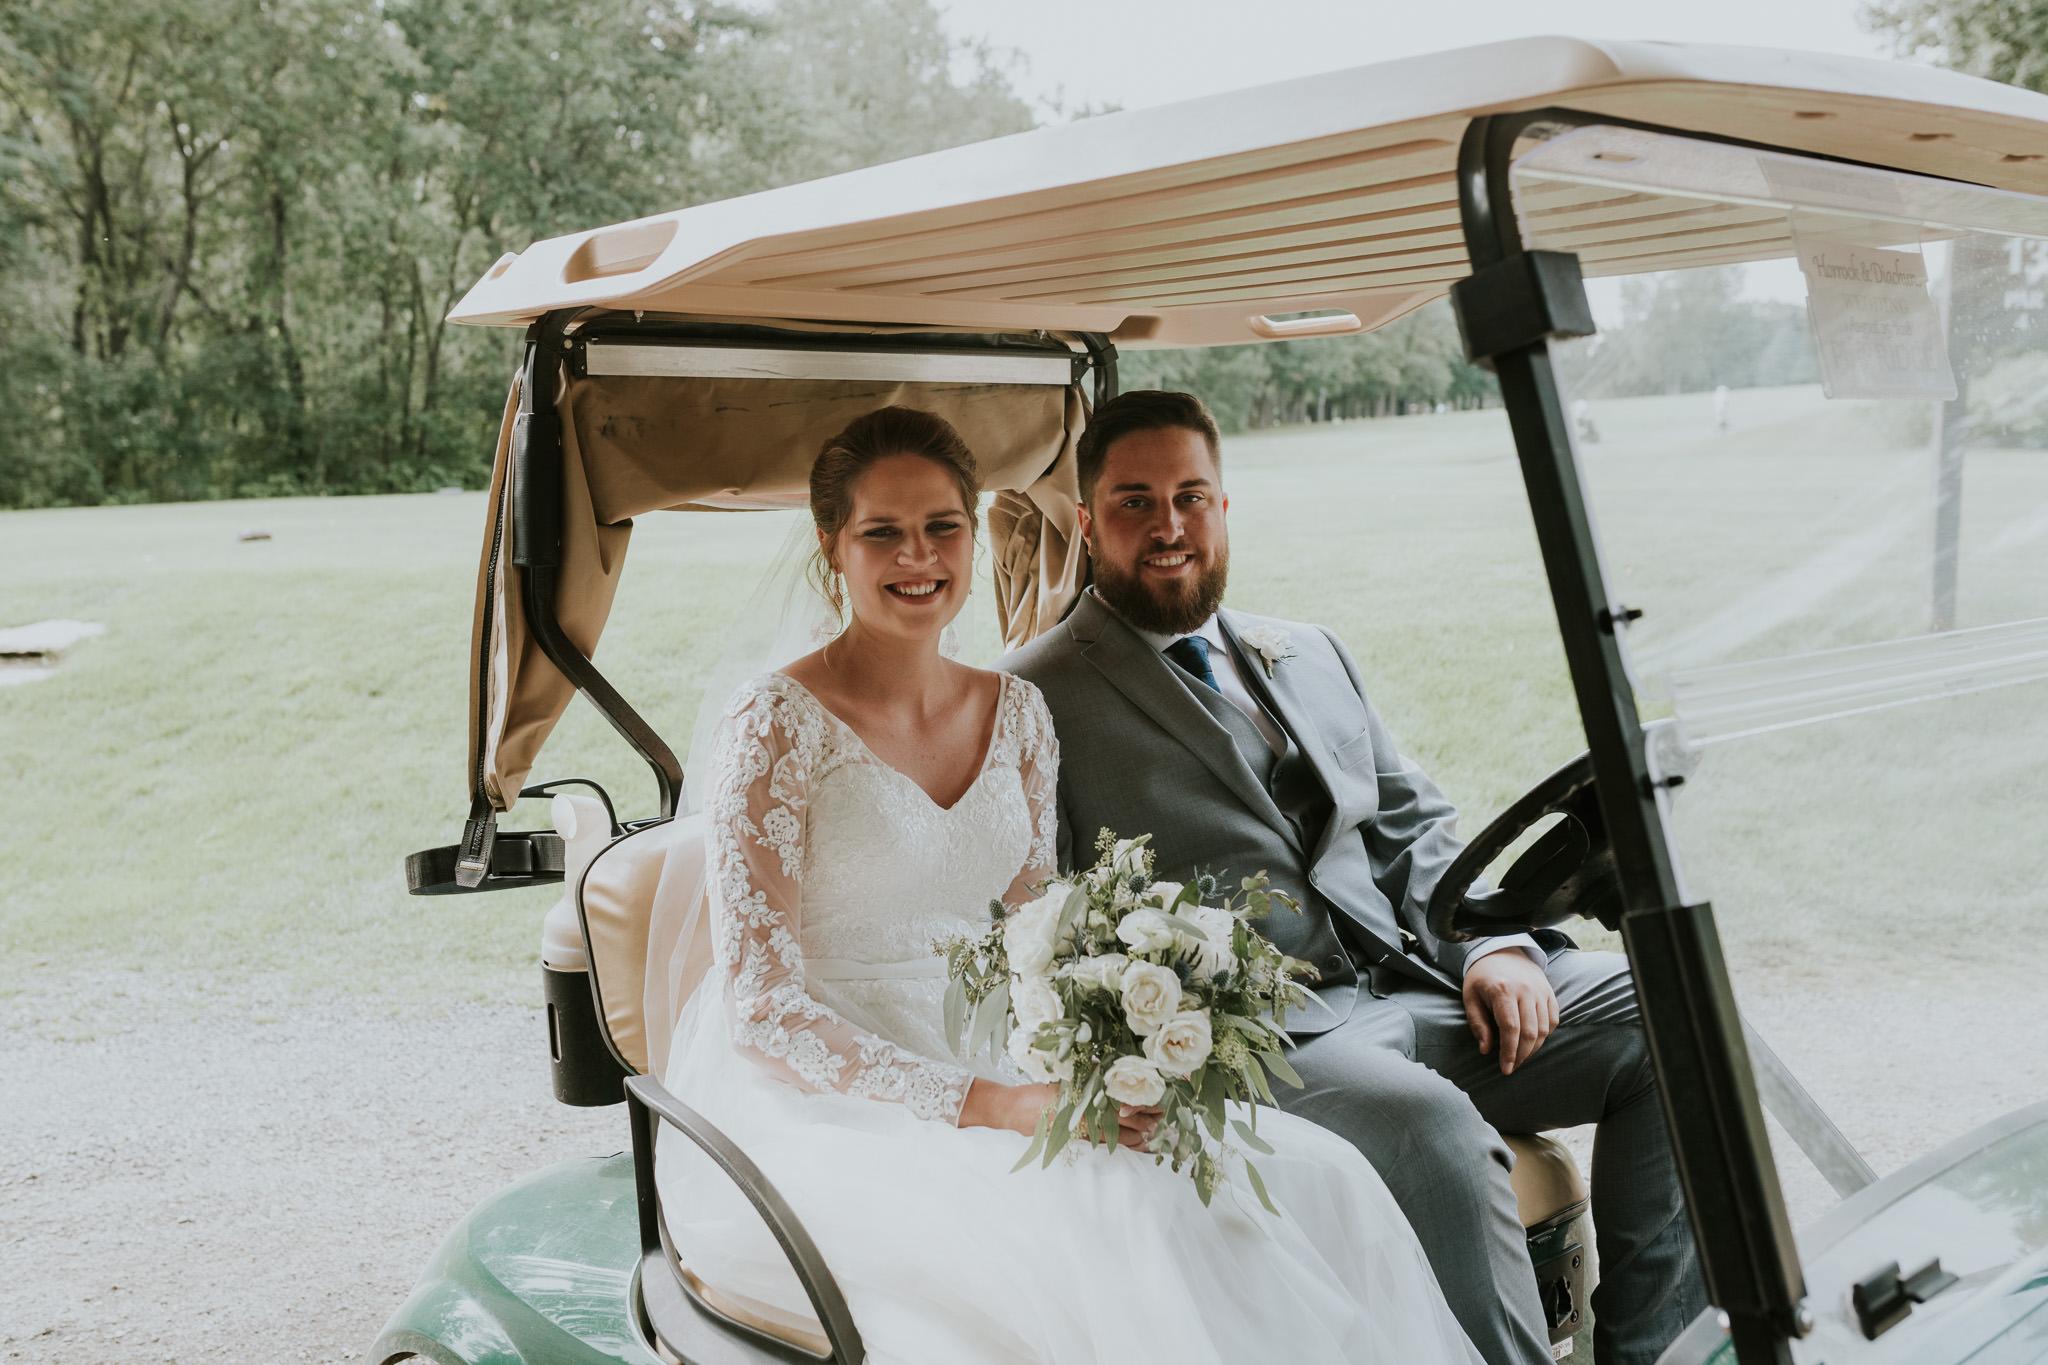 pine-ridge-golf-course-winnipeg-wedding-55.jpg